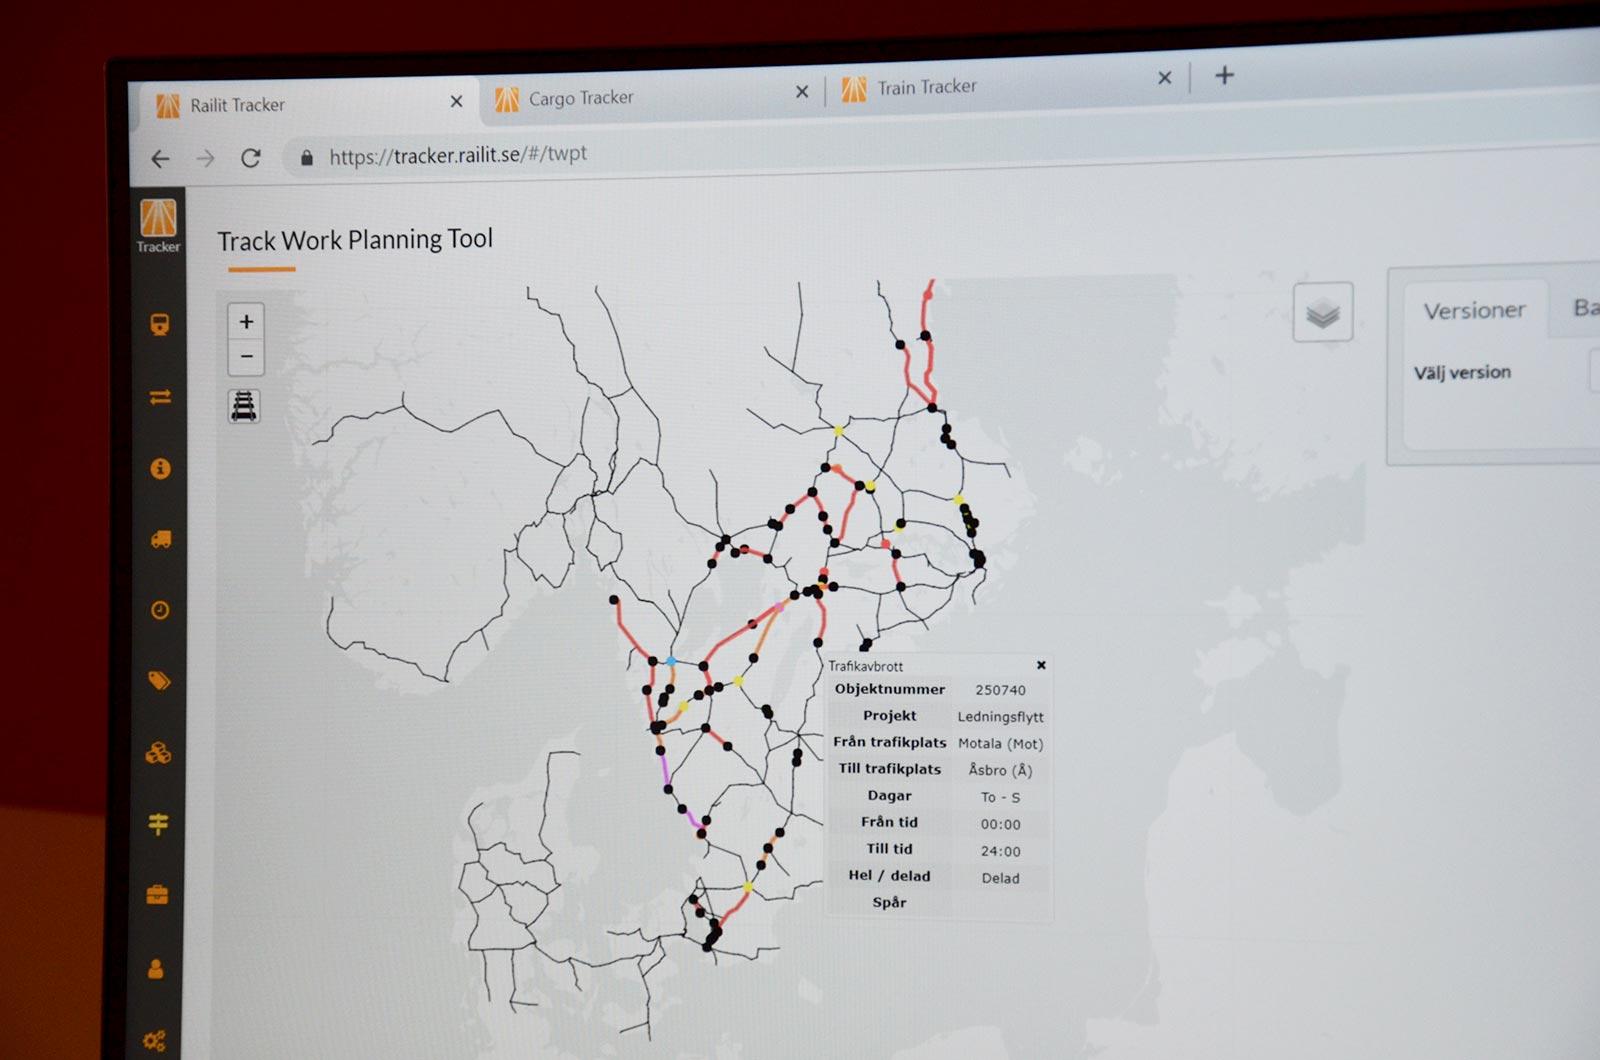 Track Work Planning Tool